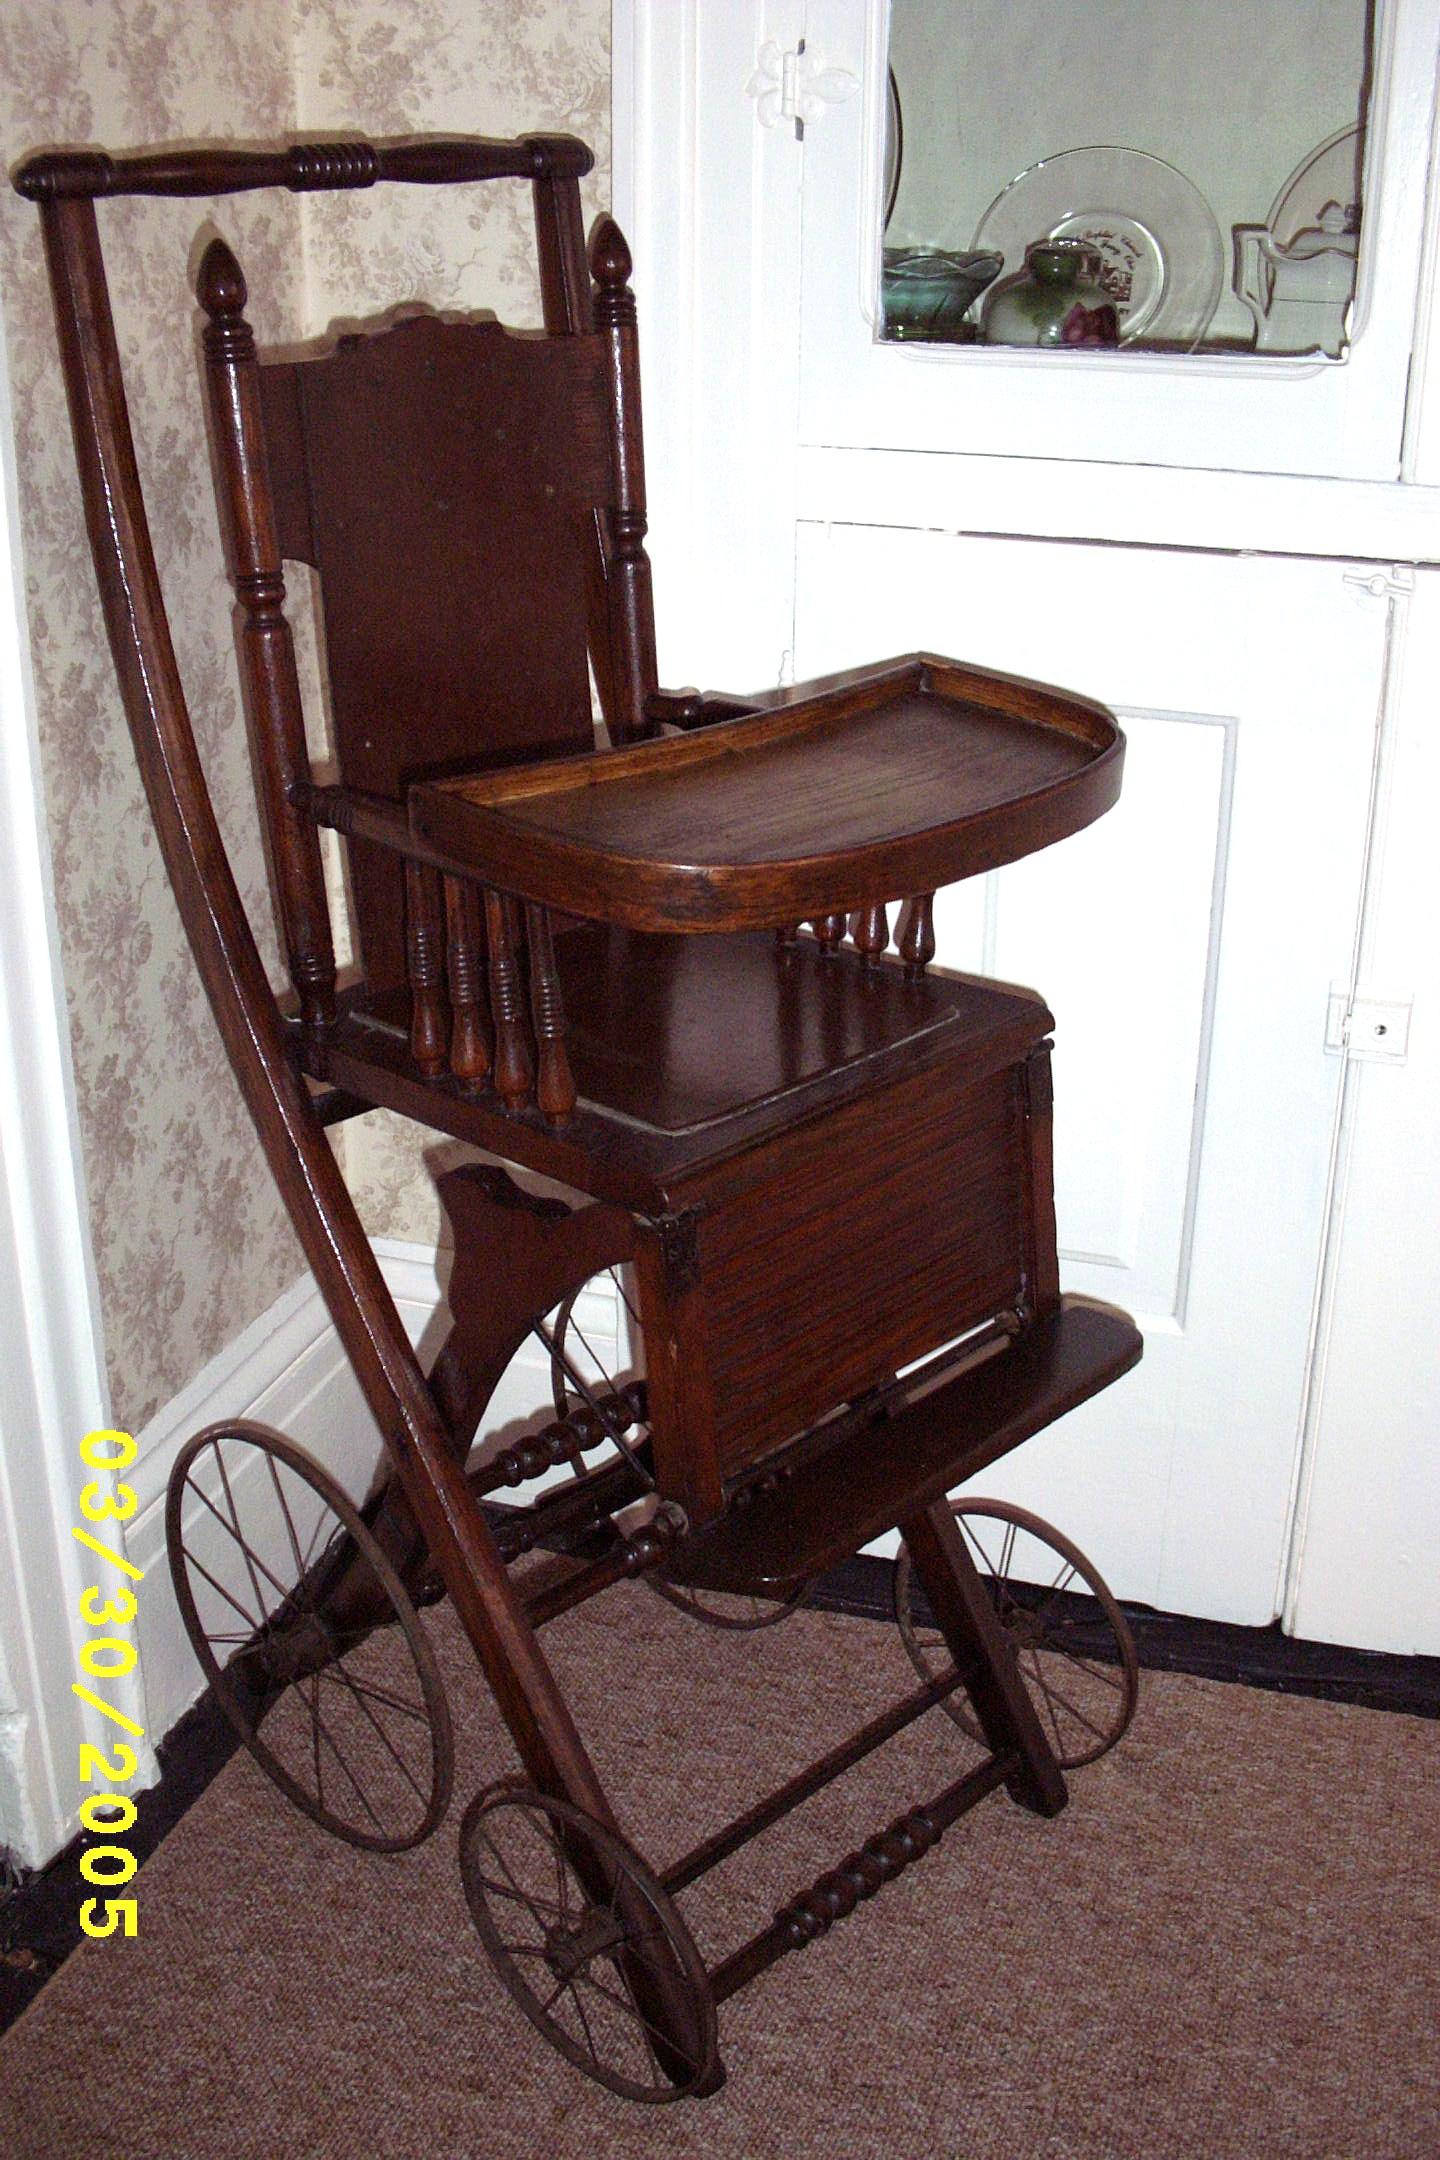 Sedgwick's highchair